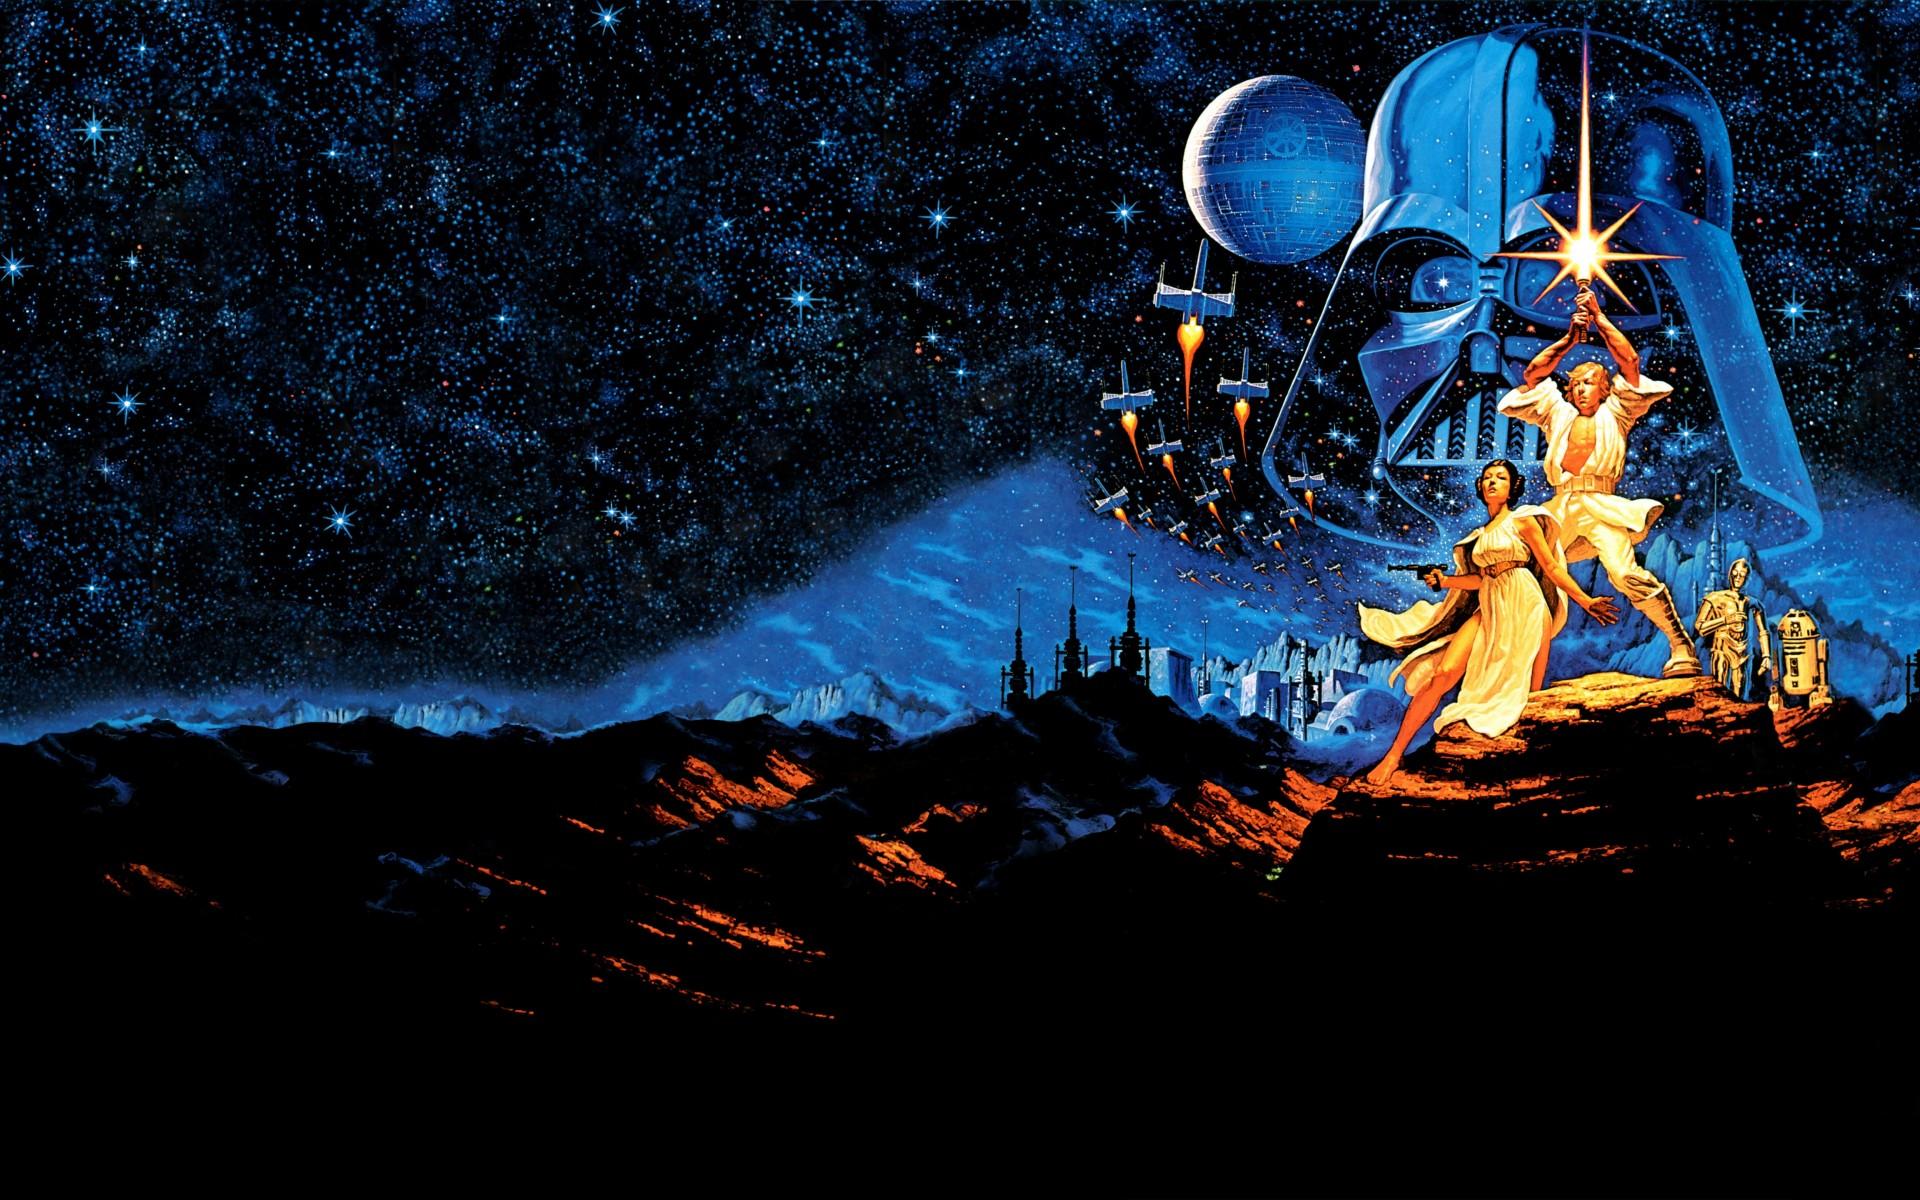 Star Wars Iv Comic 1920x1200 Wallpaper Thewallpaperkid Com